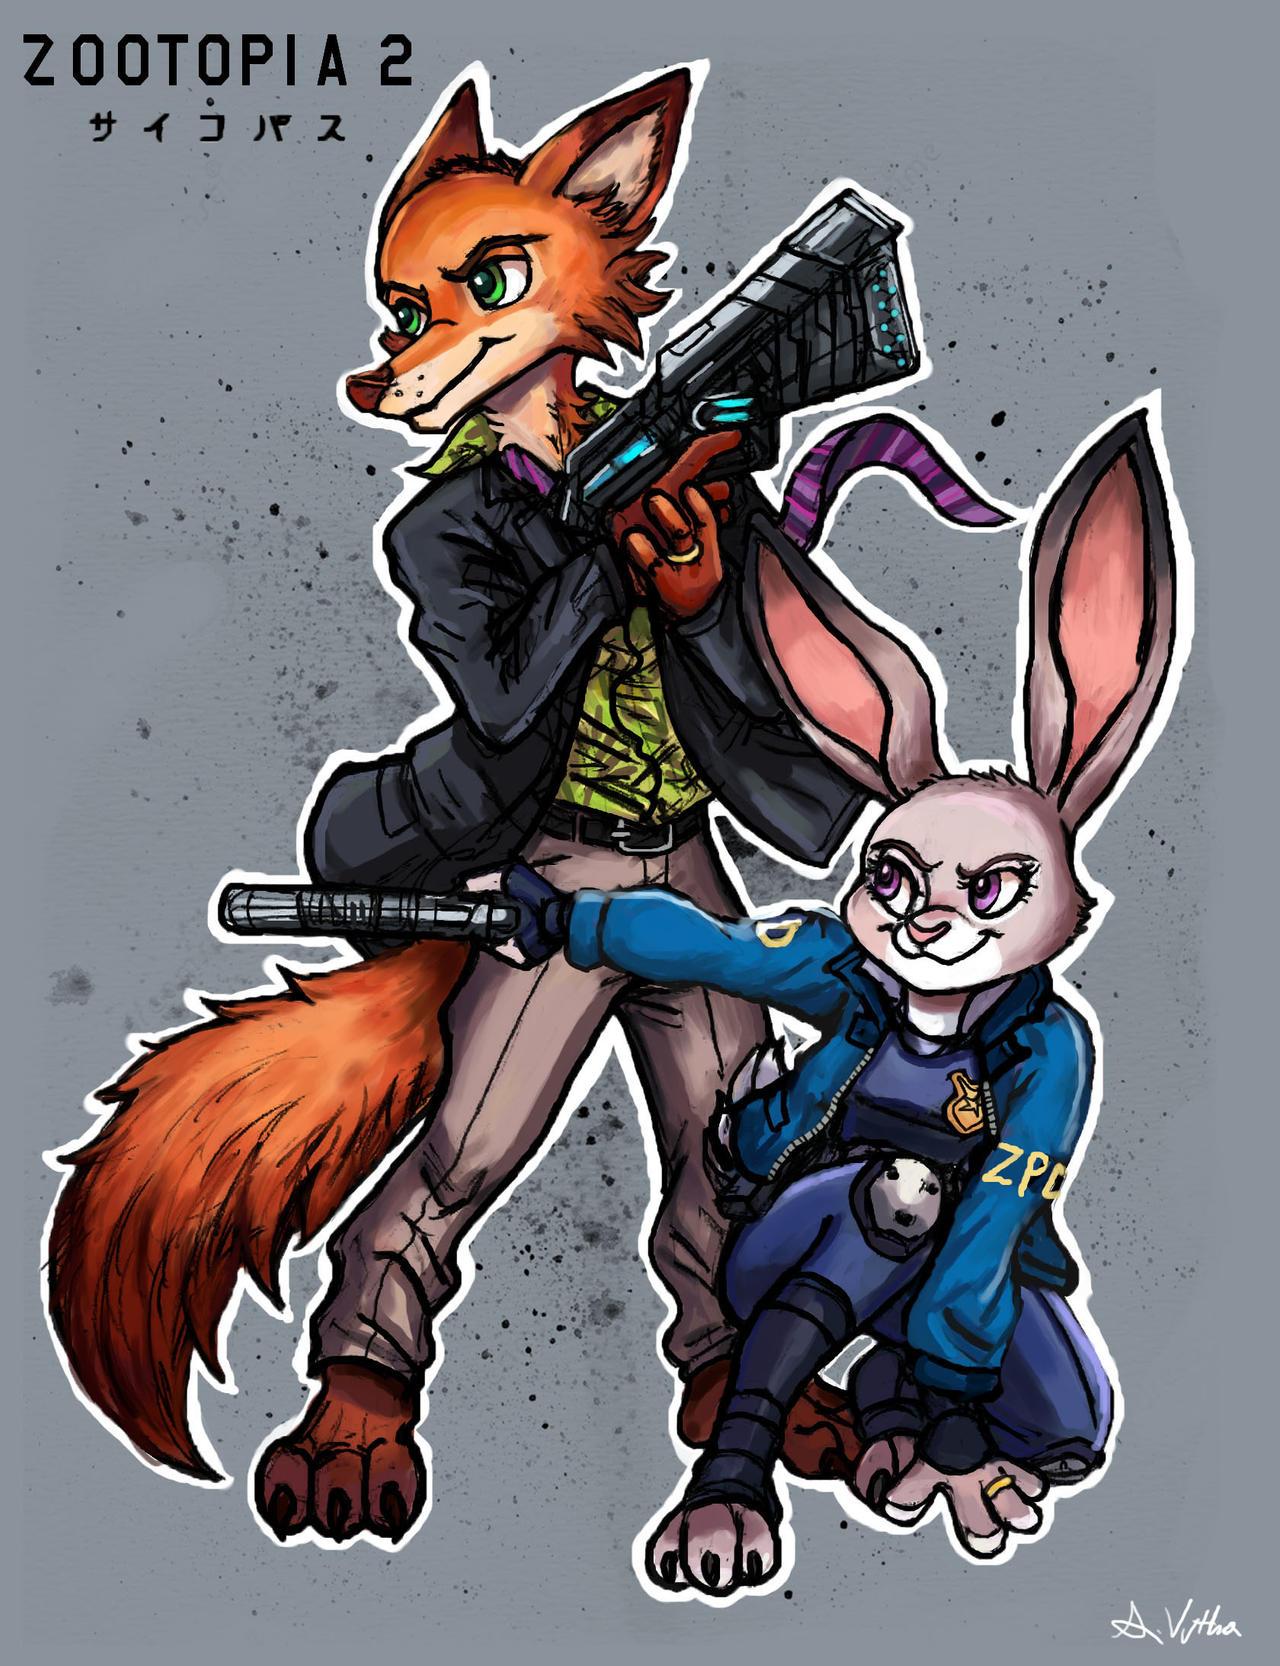 Nick and Judy - Zootopia/Psychopass 02